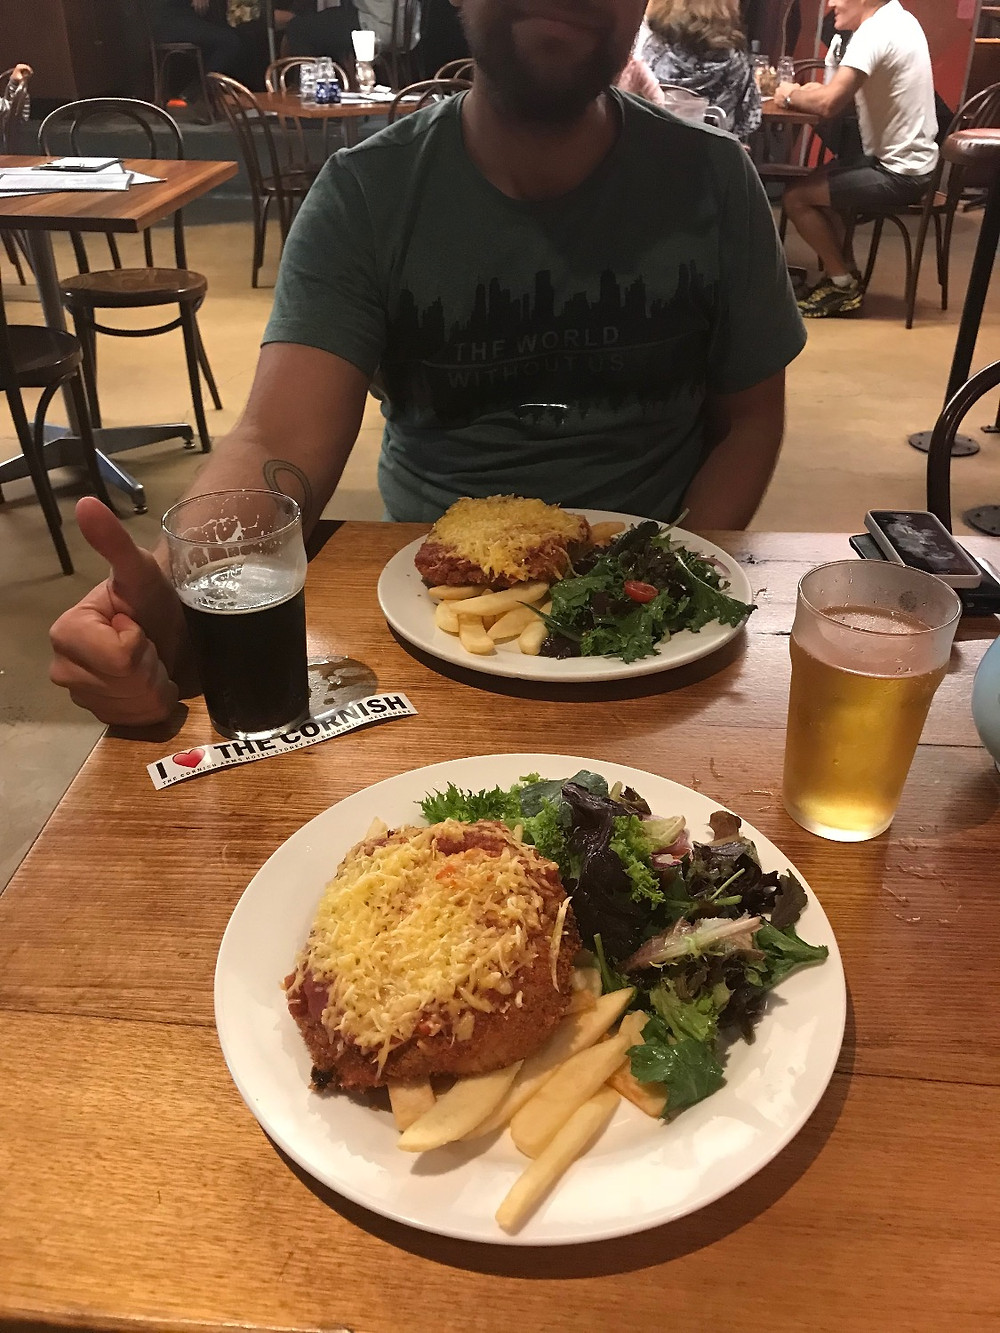 Beer (Coldstream Porter) makes everything okay